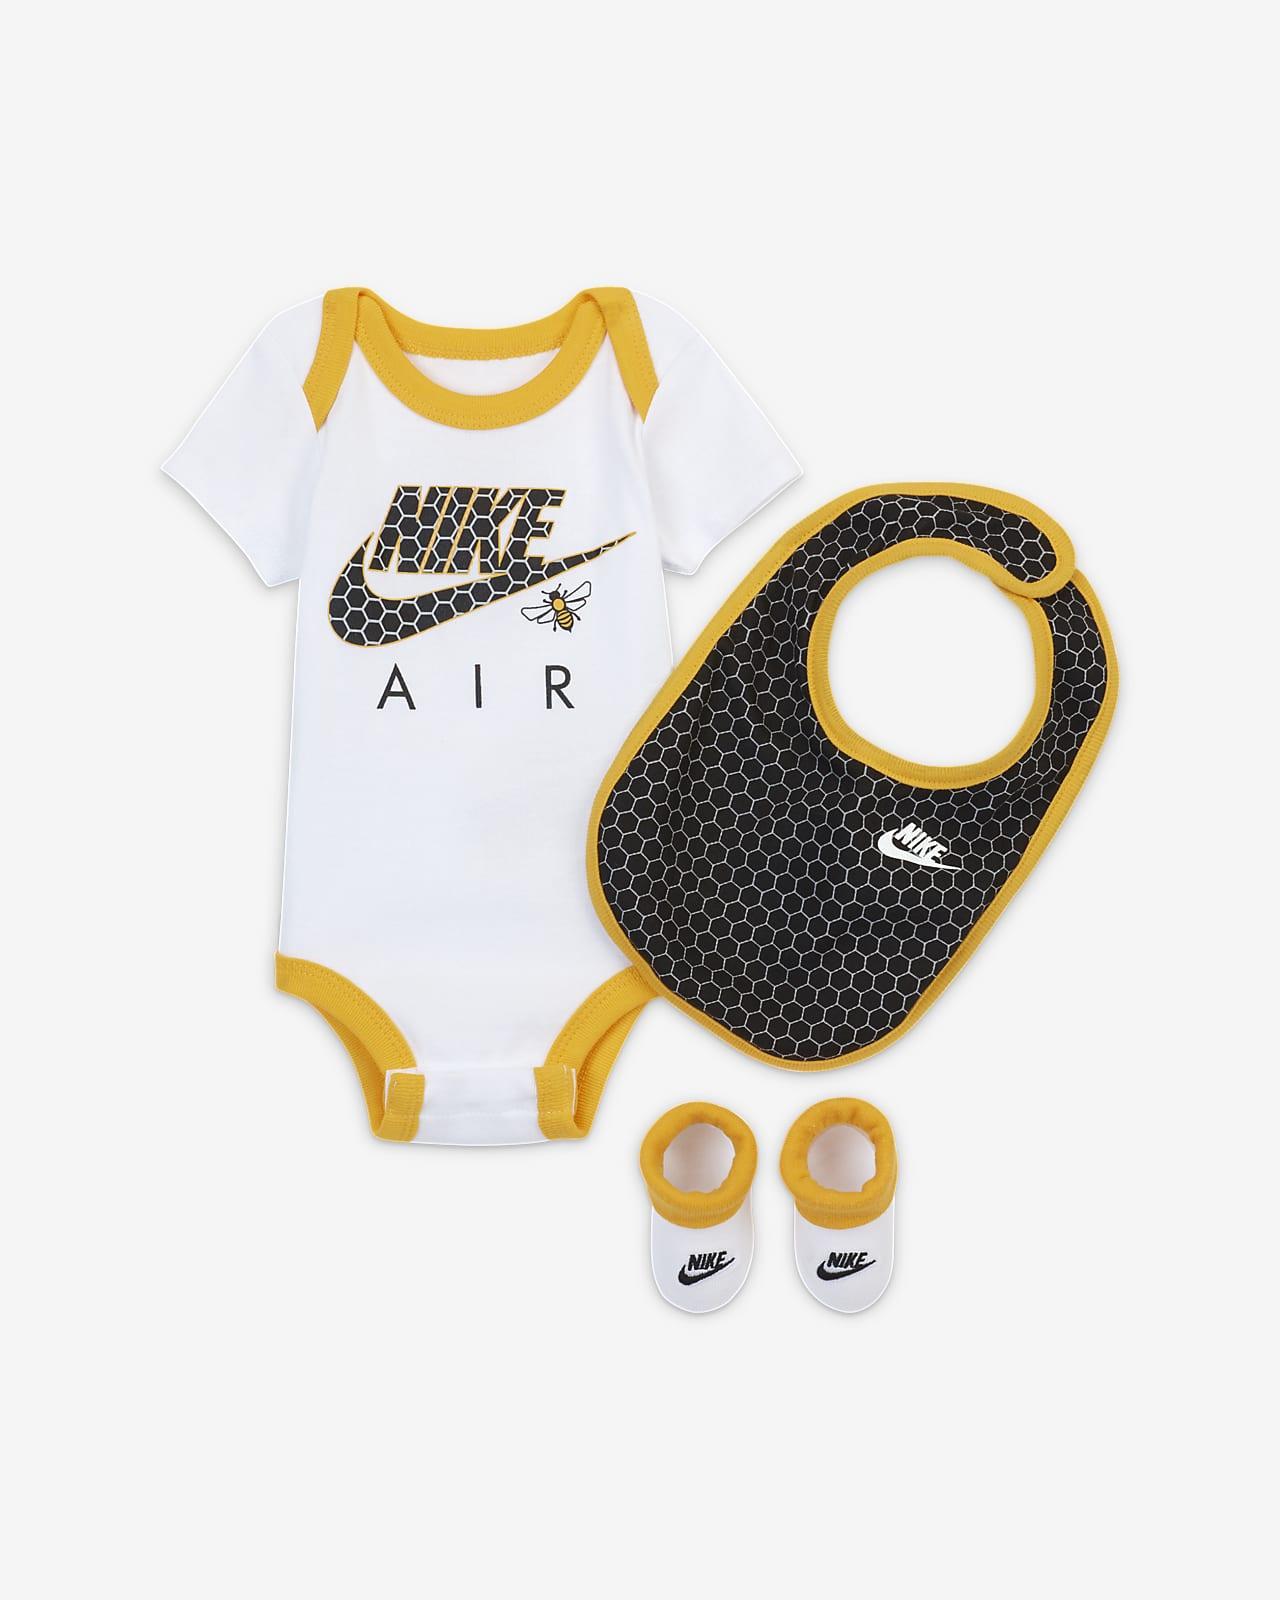 Nike Air Baby 3-Piece Box Set